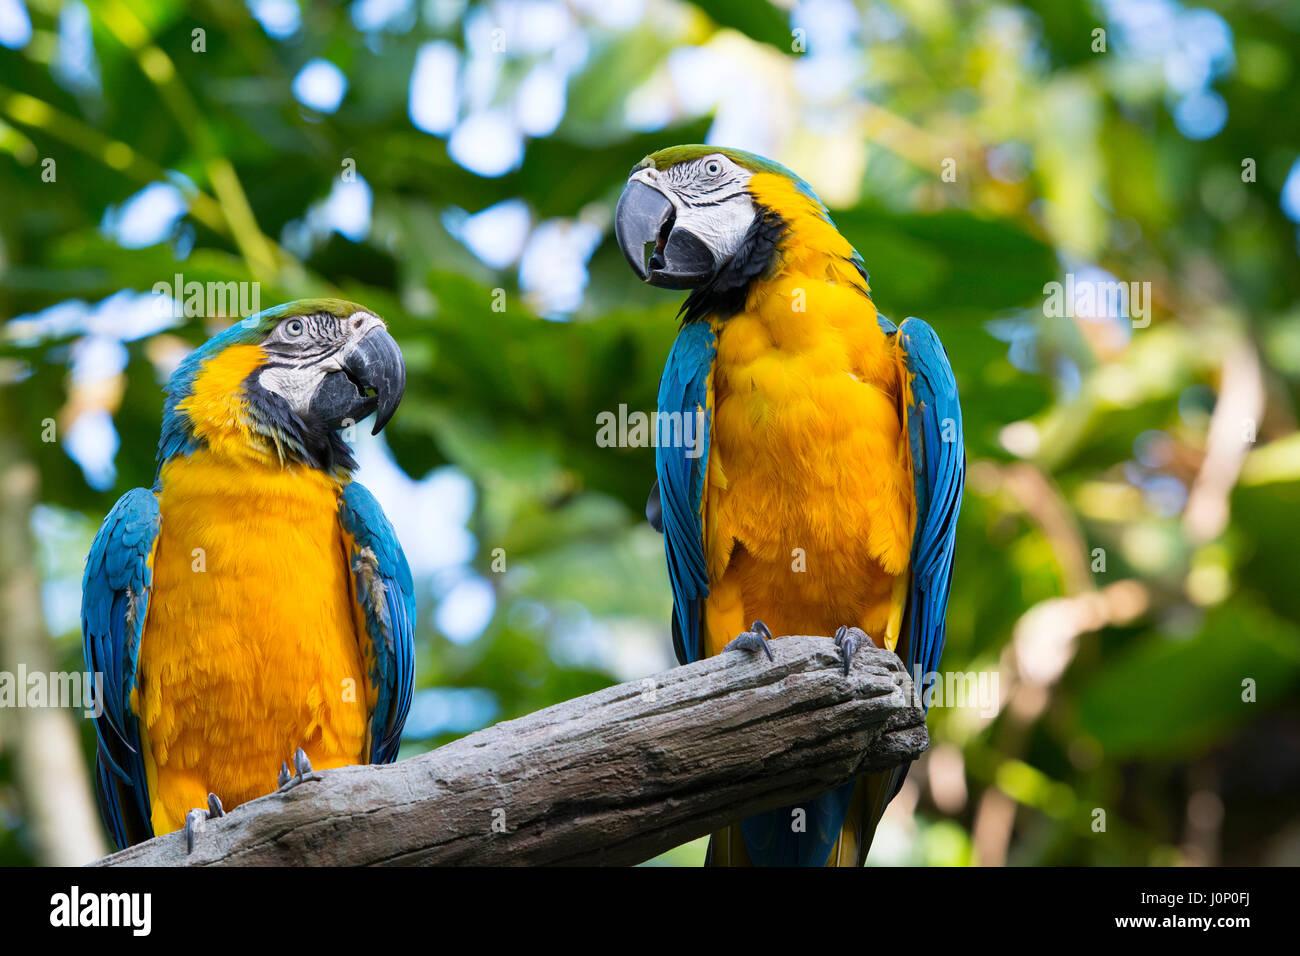 Macaw Parrots, Blue and Yellow Gold, Disney Animal Kingdom, Disney World, Orlando Florida - Stock Image